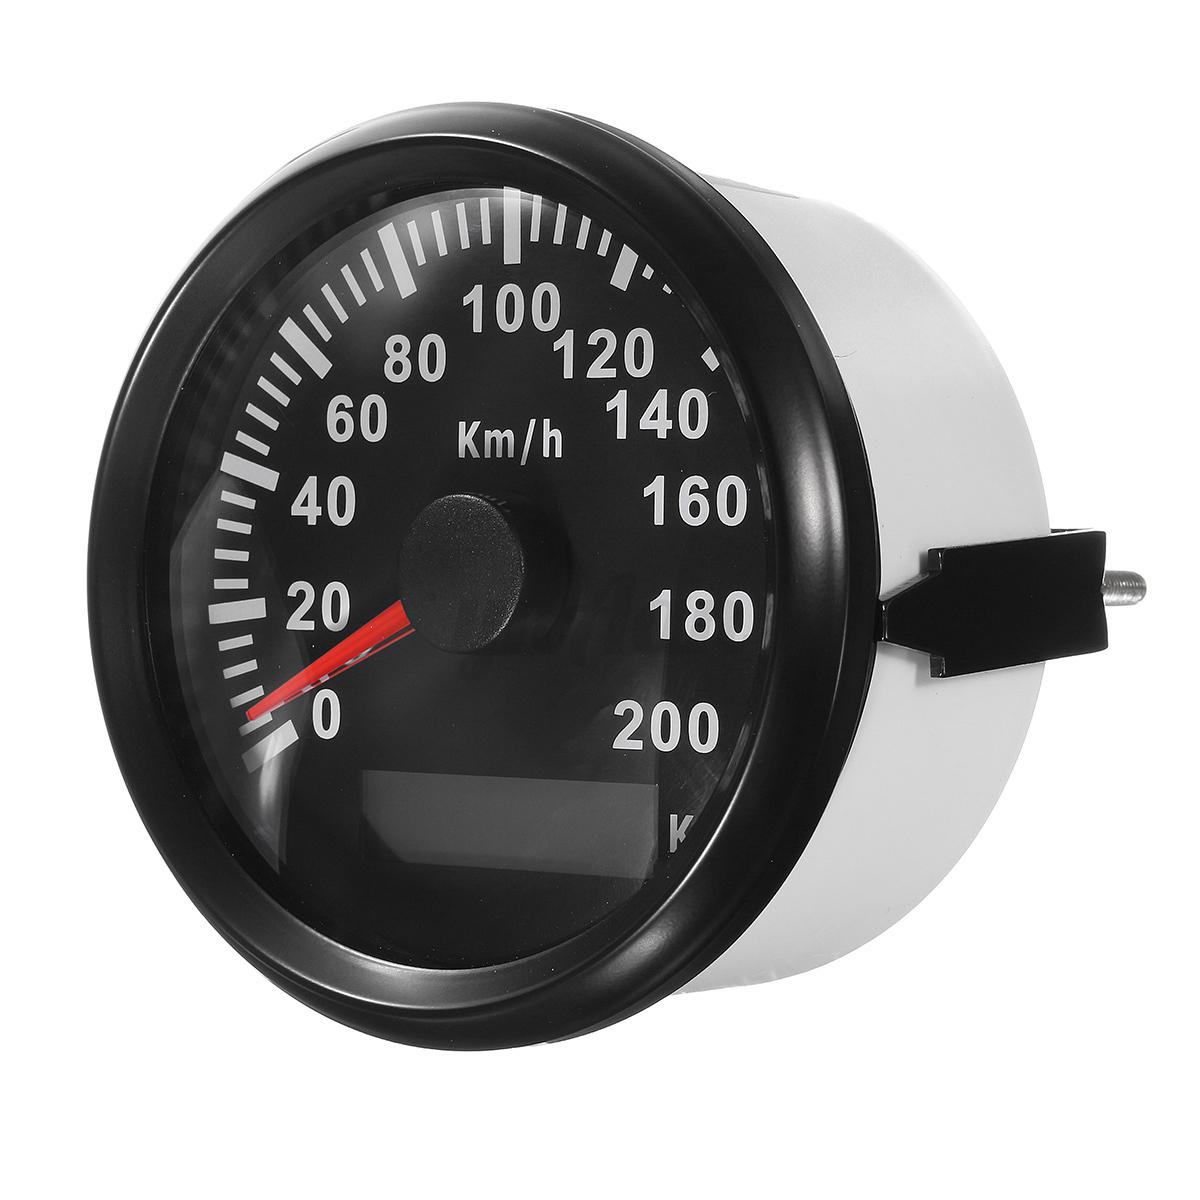 auto motorrad tachometer ip67 200km h gps digital tacho. Black Bedroom Furniture Sets. Home Design Ideas